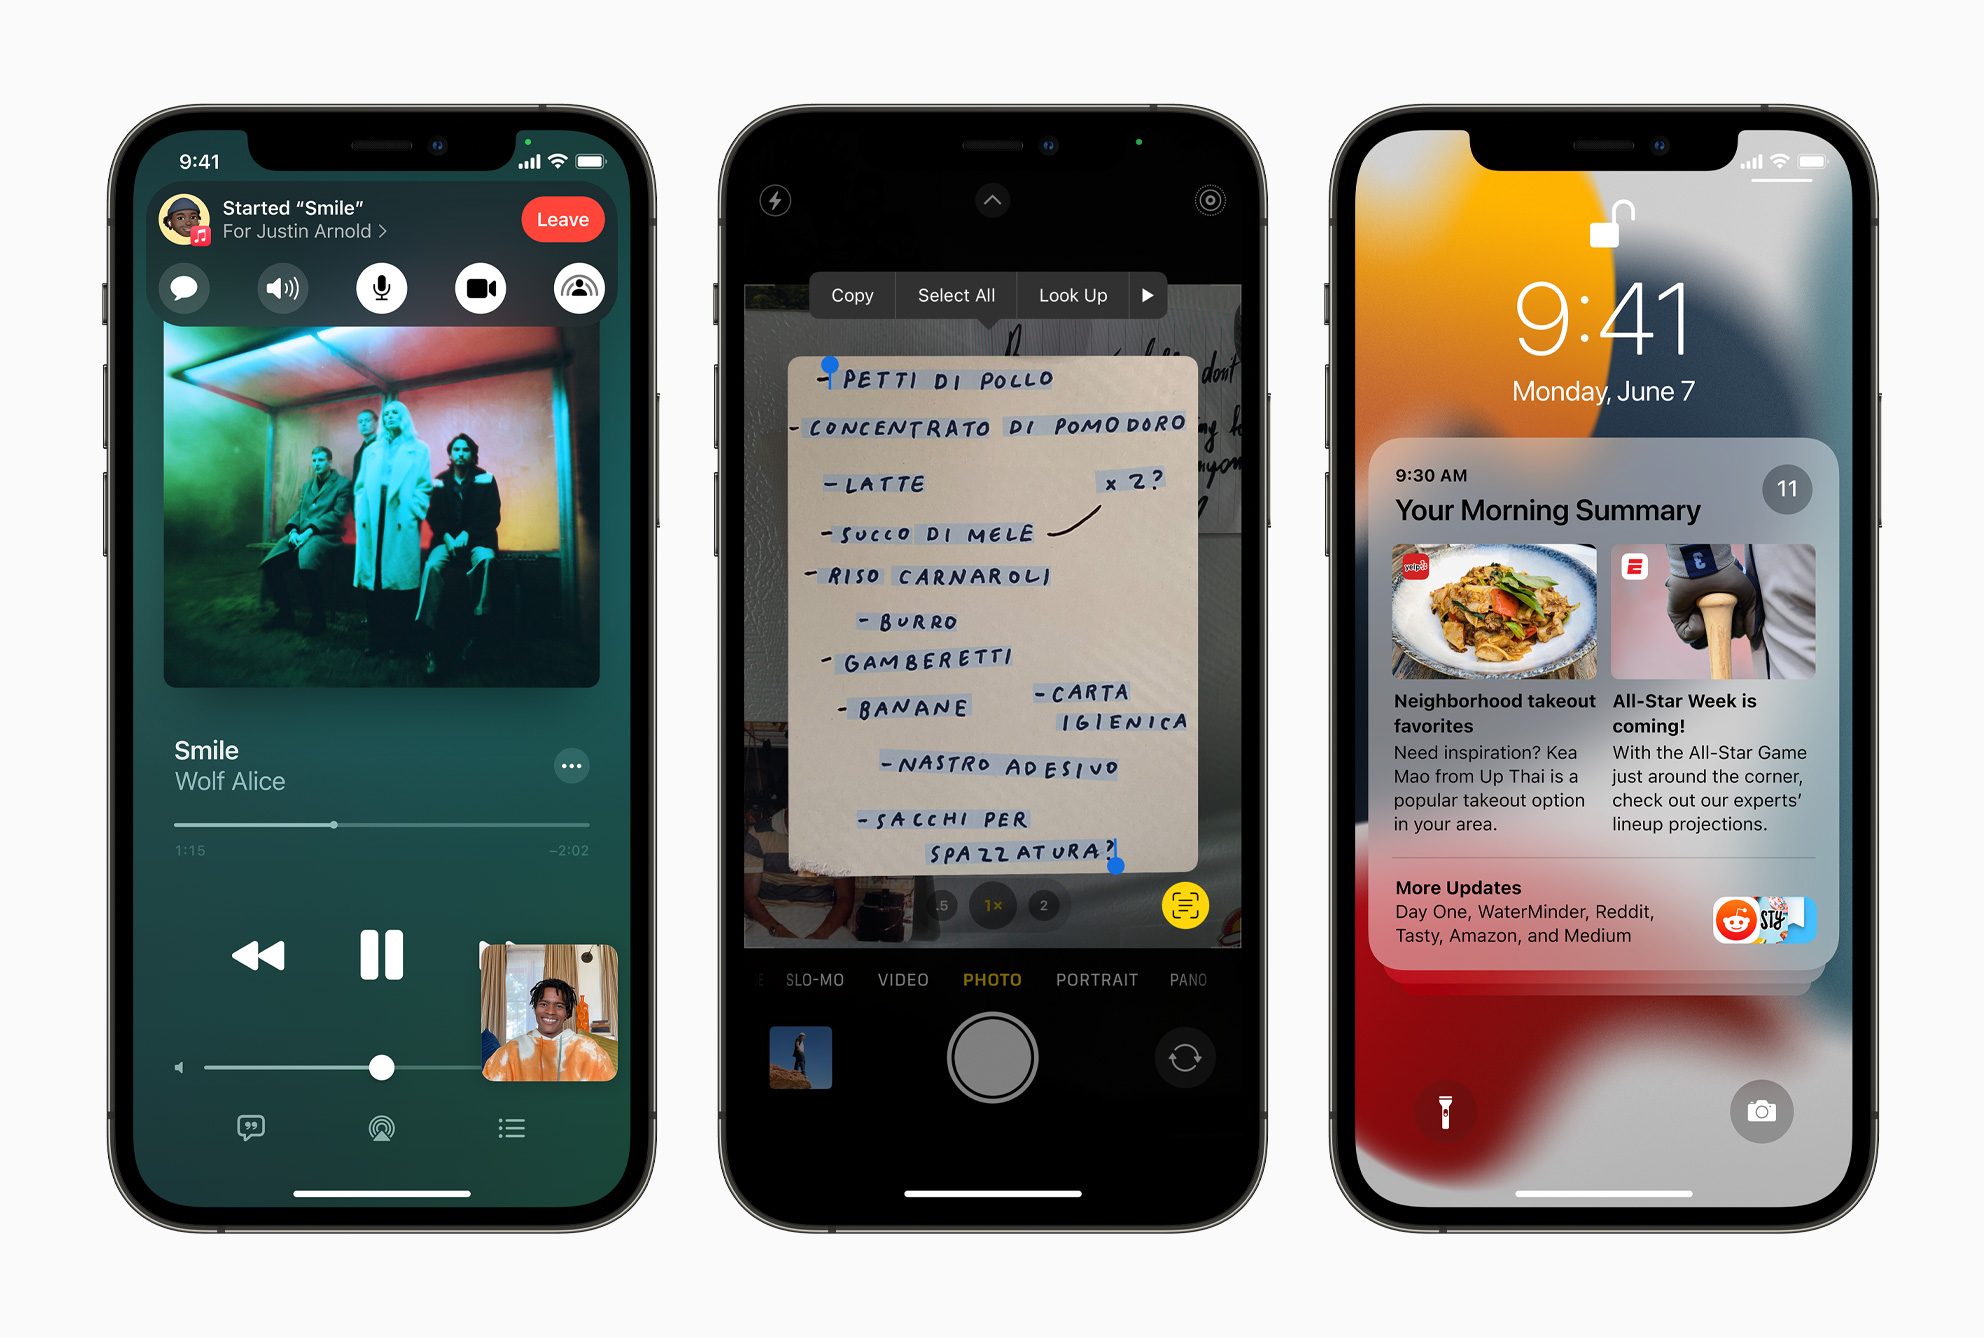 Three iPhones running iOS 15